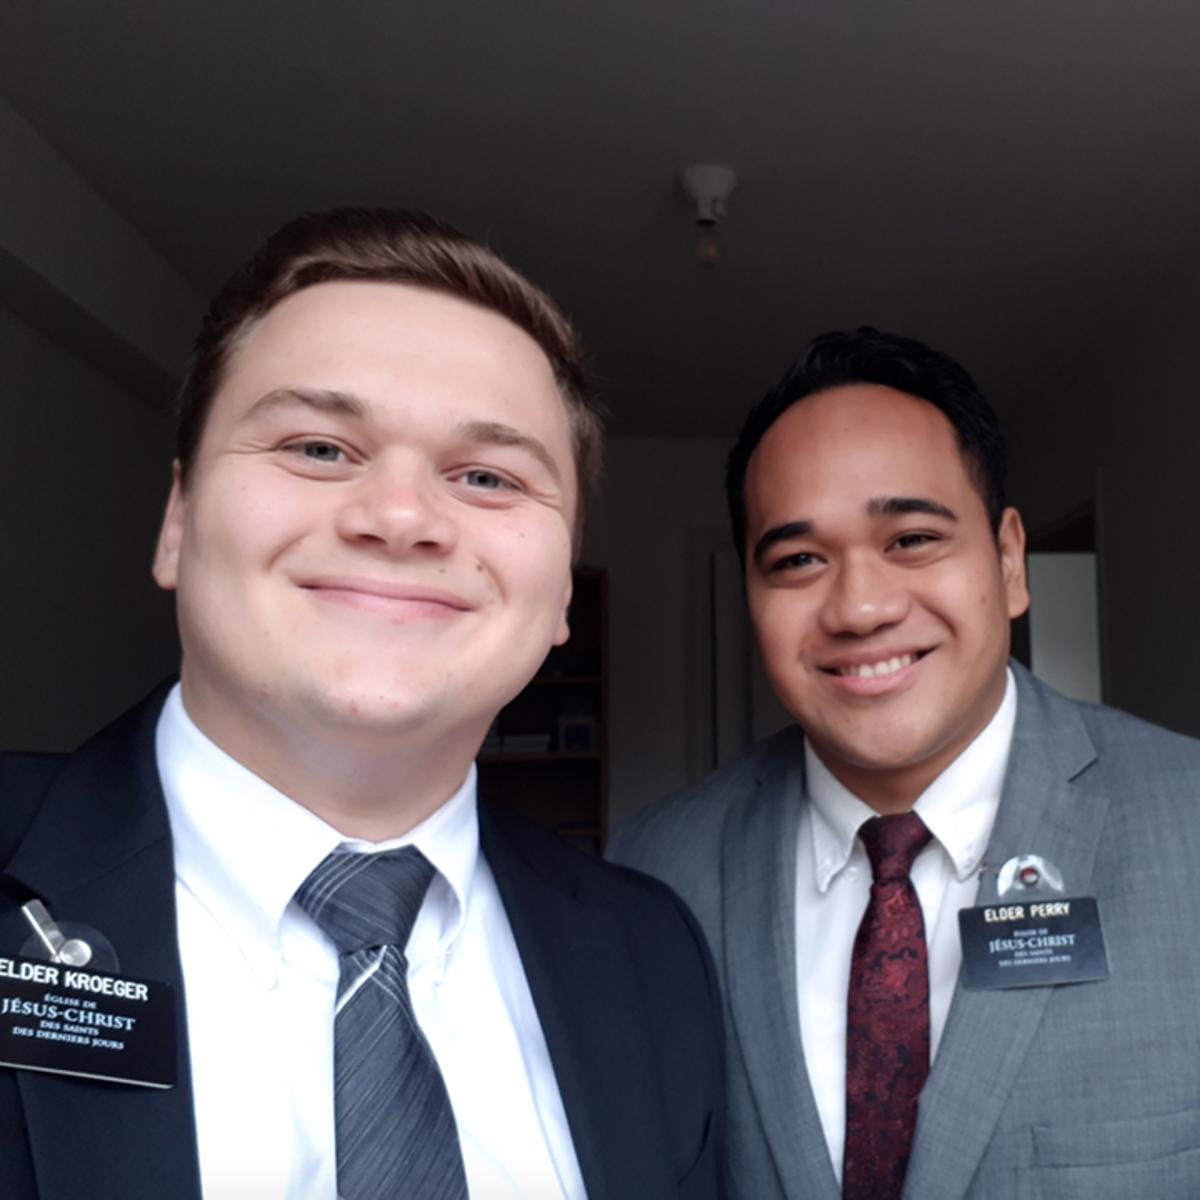 Elder Kroeger and Elder Perry